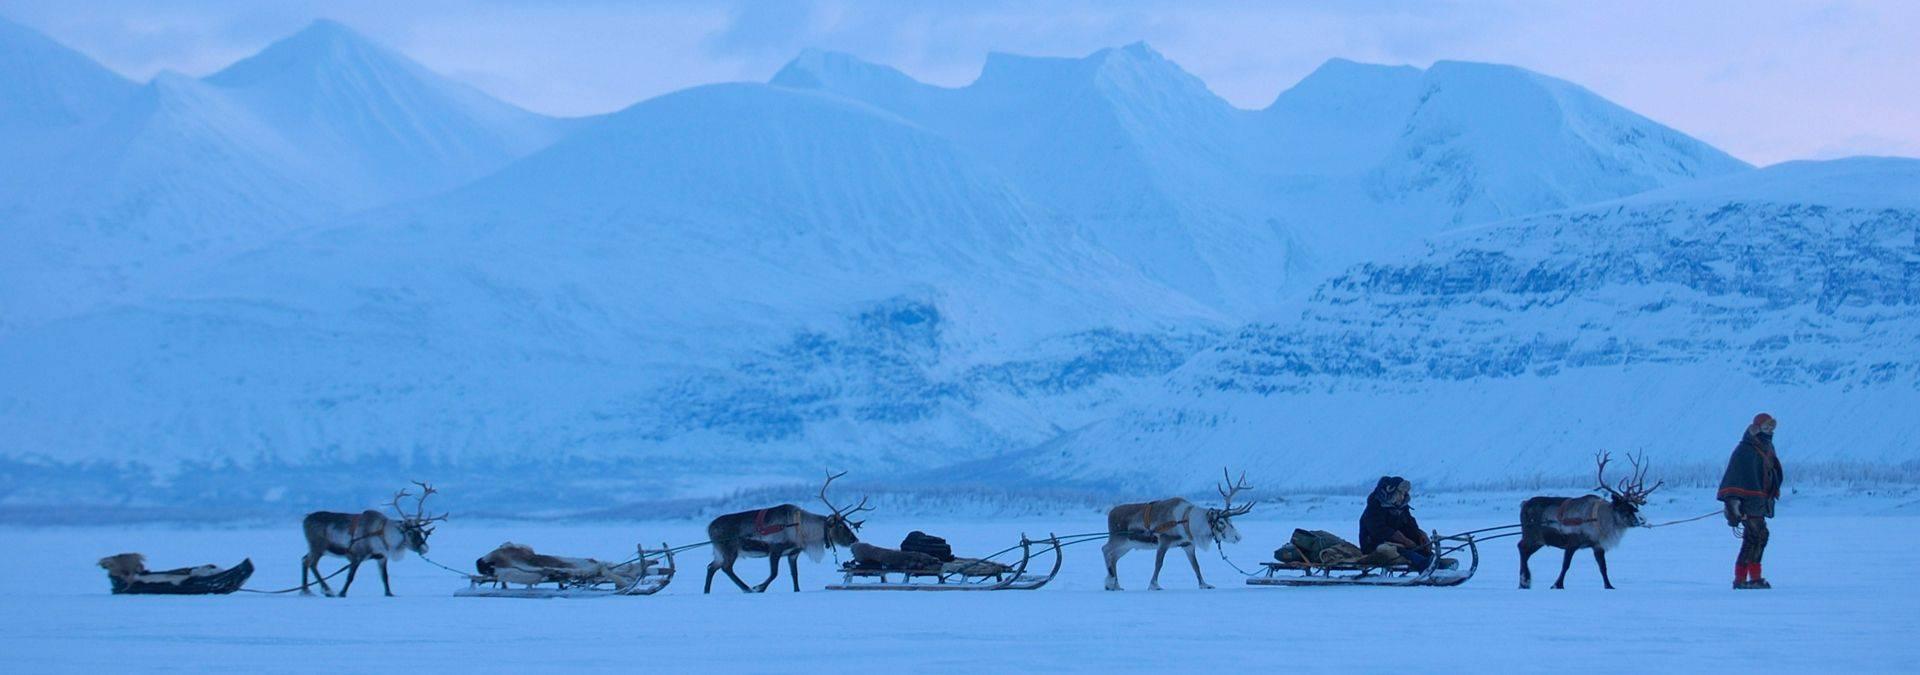 Staffan Widstrand and Visit Sweden -sami_lapland Northern Norway.jpg